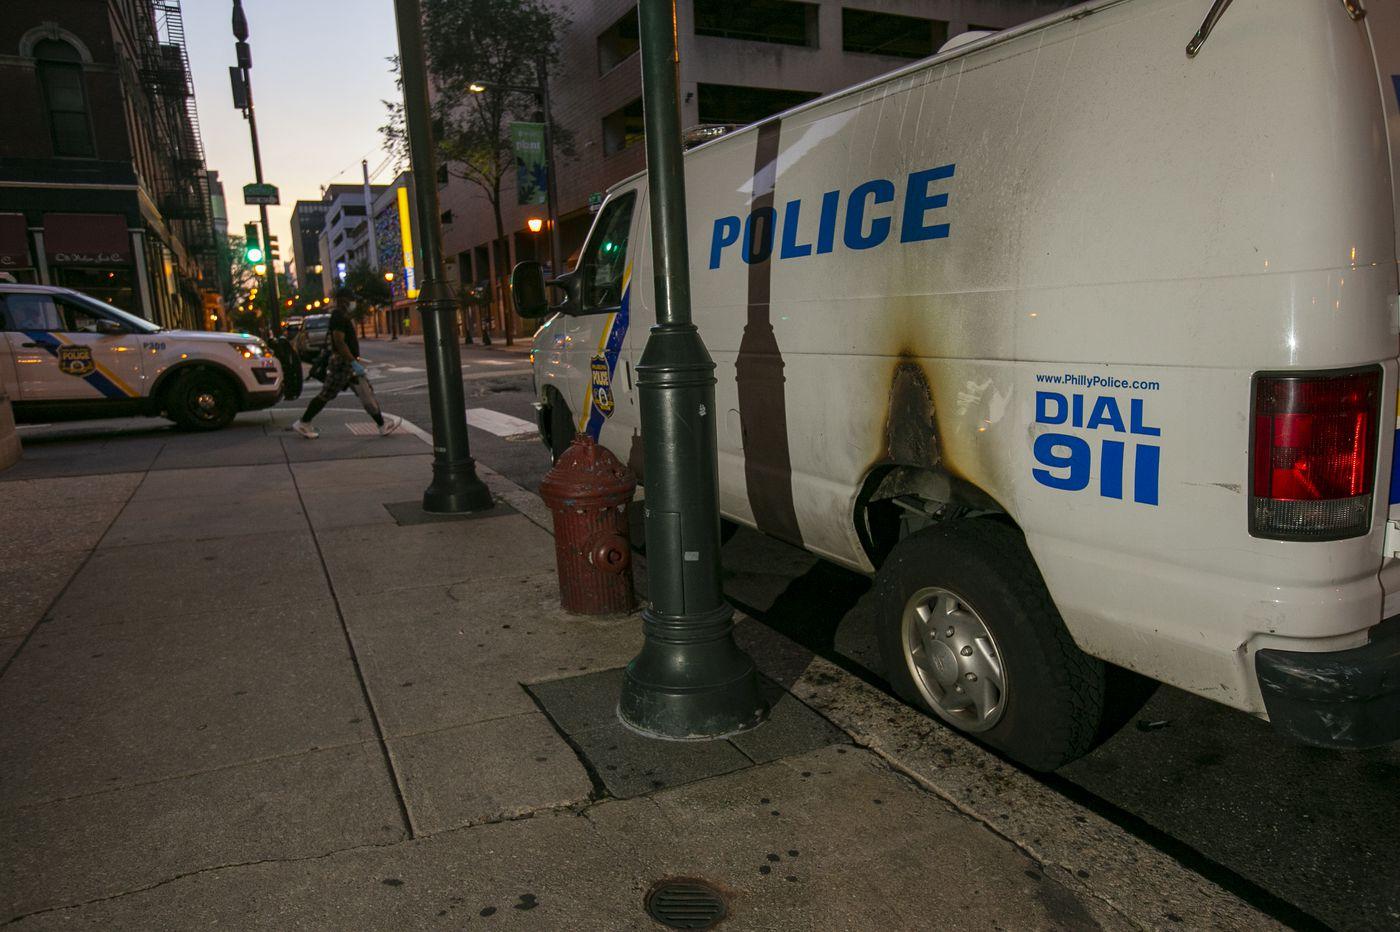 Several police cars set on fire overnight across Philadelphia